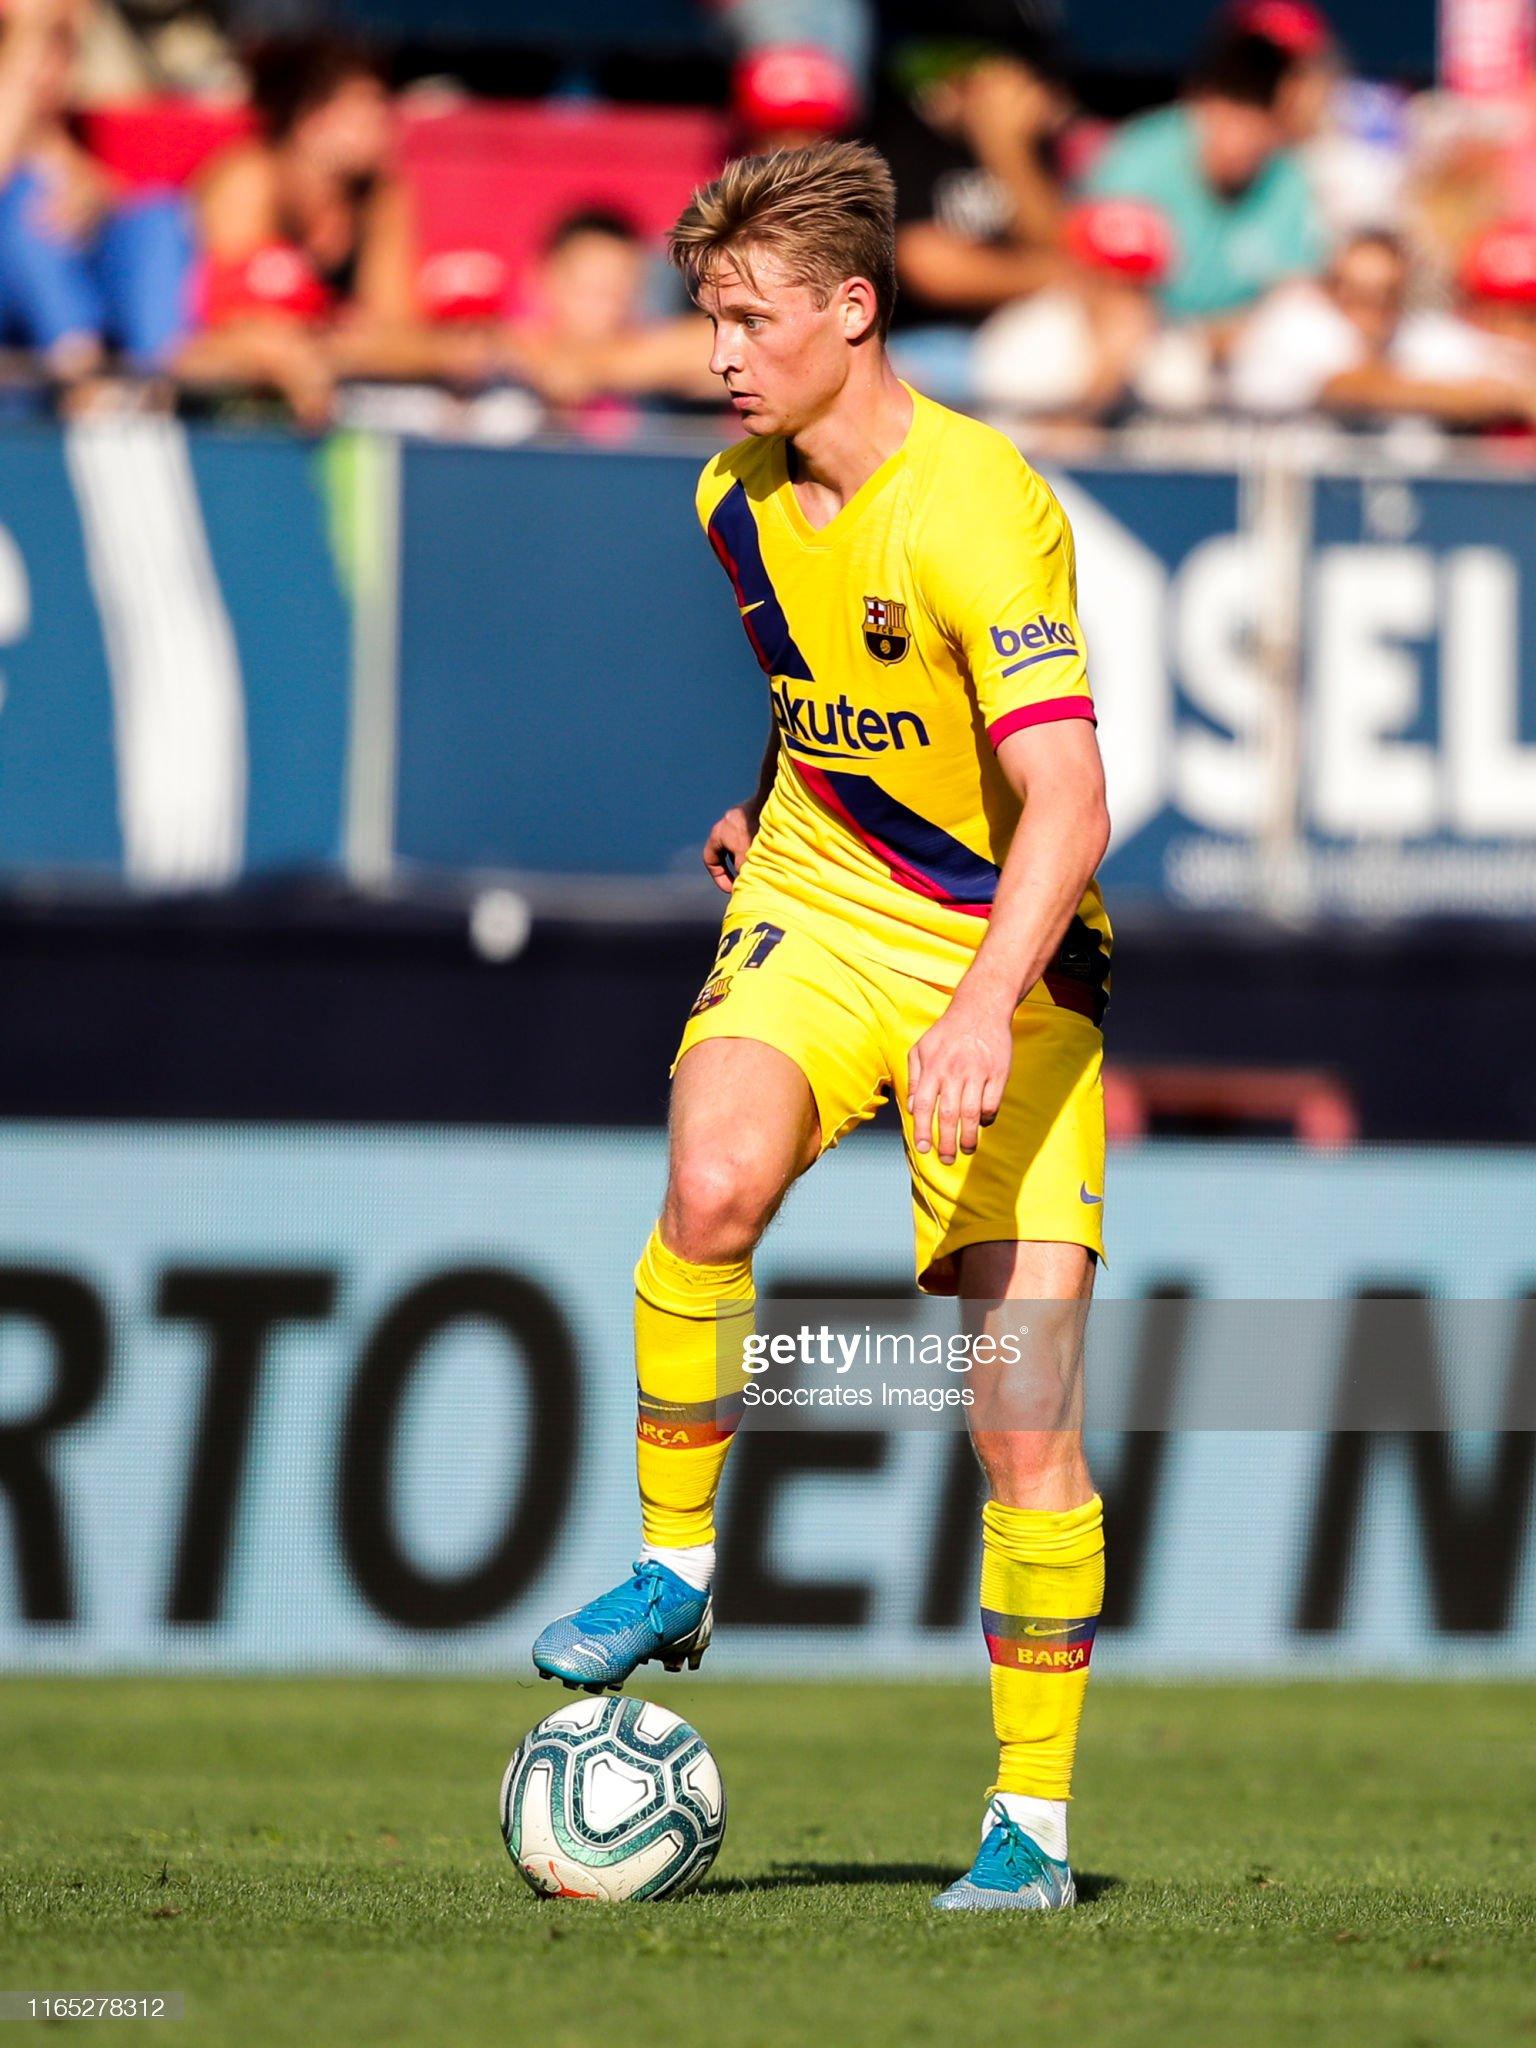 صور مباراة : أوساسونا - برشلونة 2-2 ( 31-08-2019 )  Frenkie-de-jong-of-fc-barcelona-during-the-la-liga-santander-match-picture-id1165278312?s=2048x2048